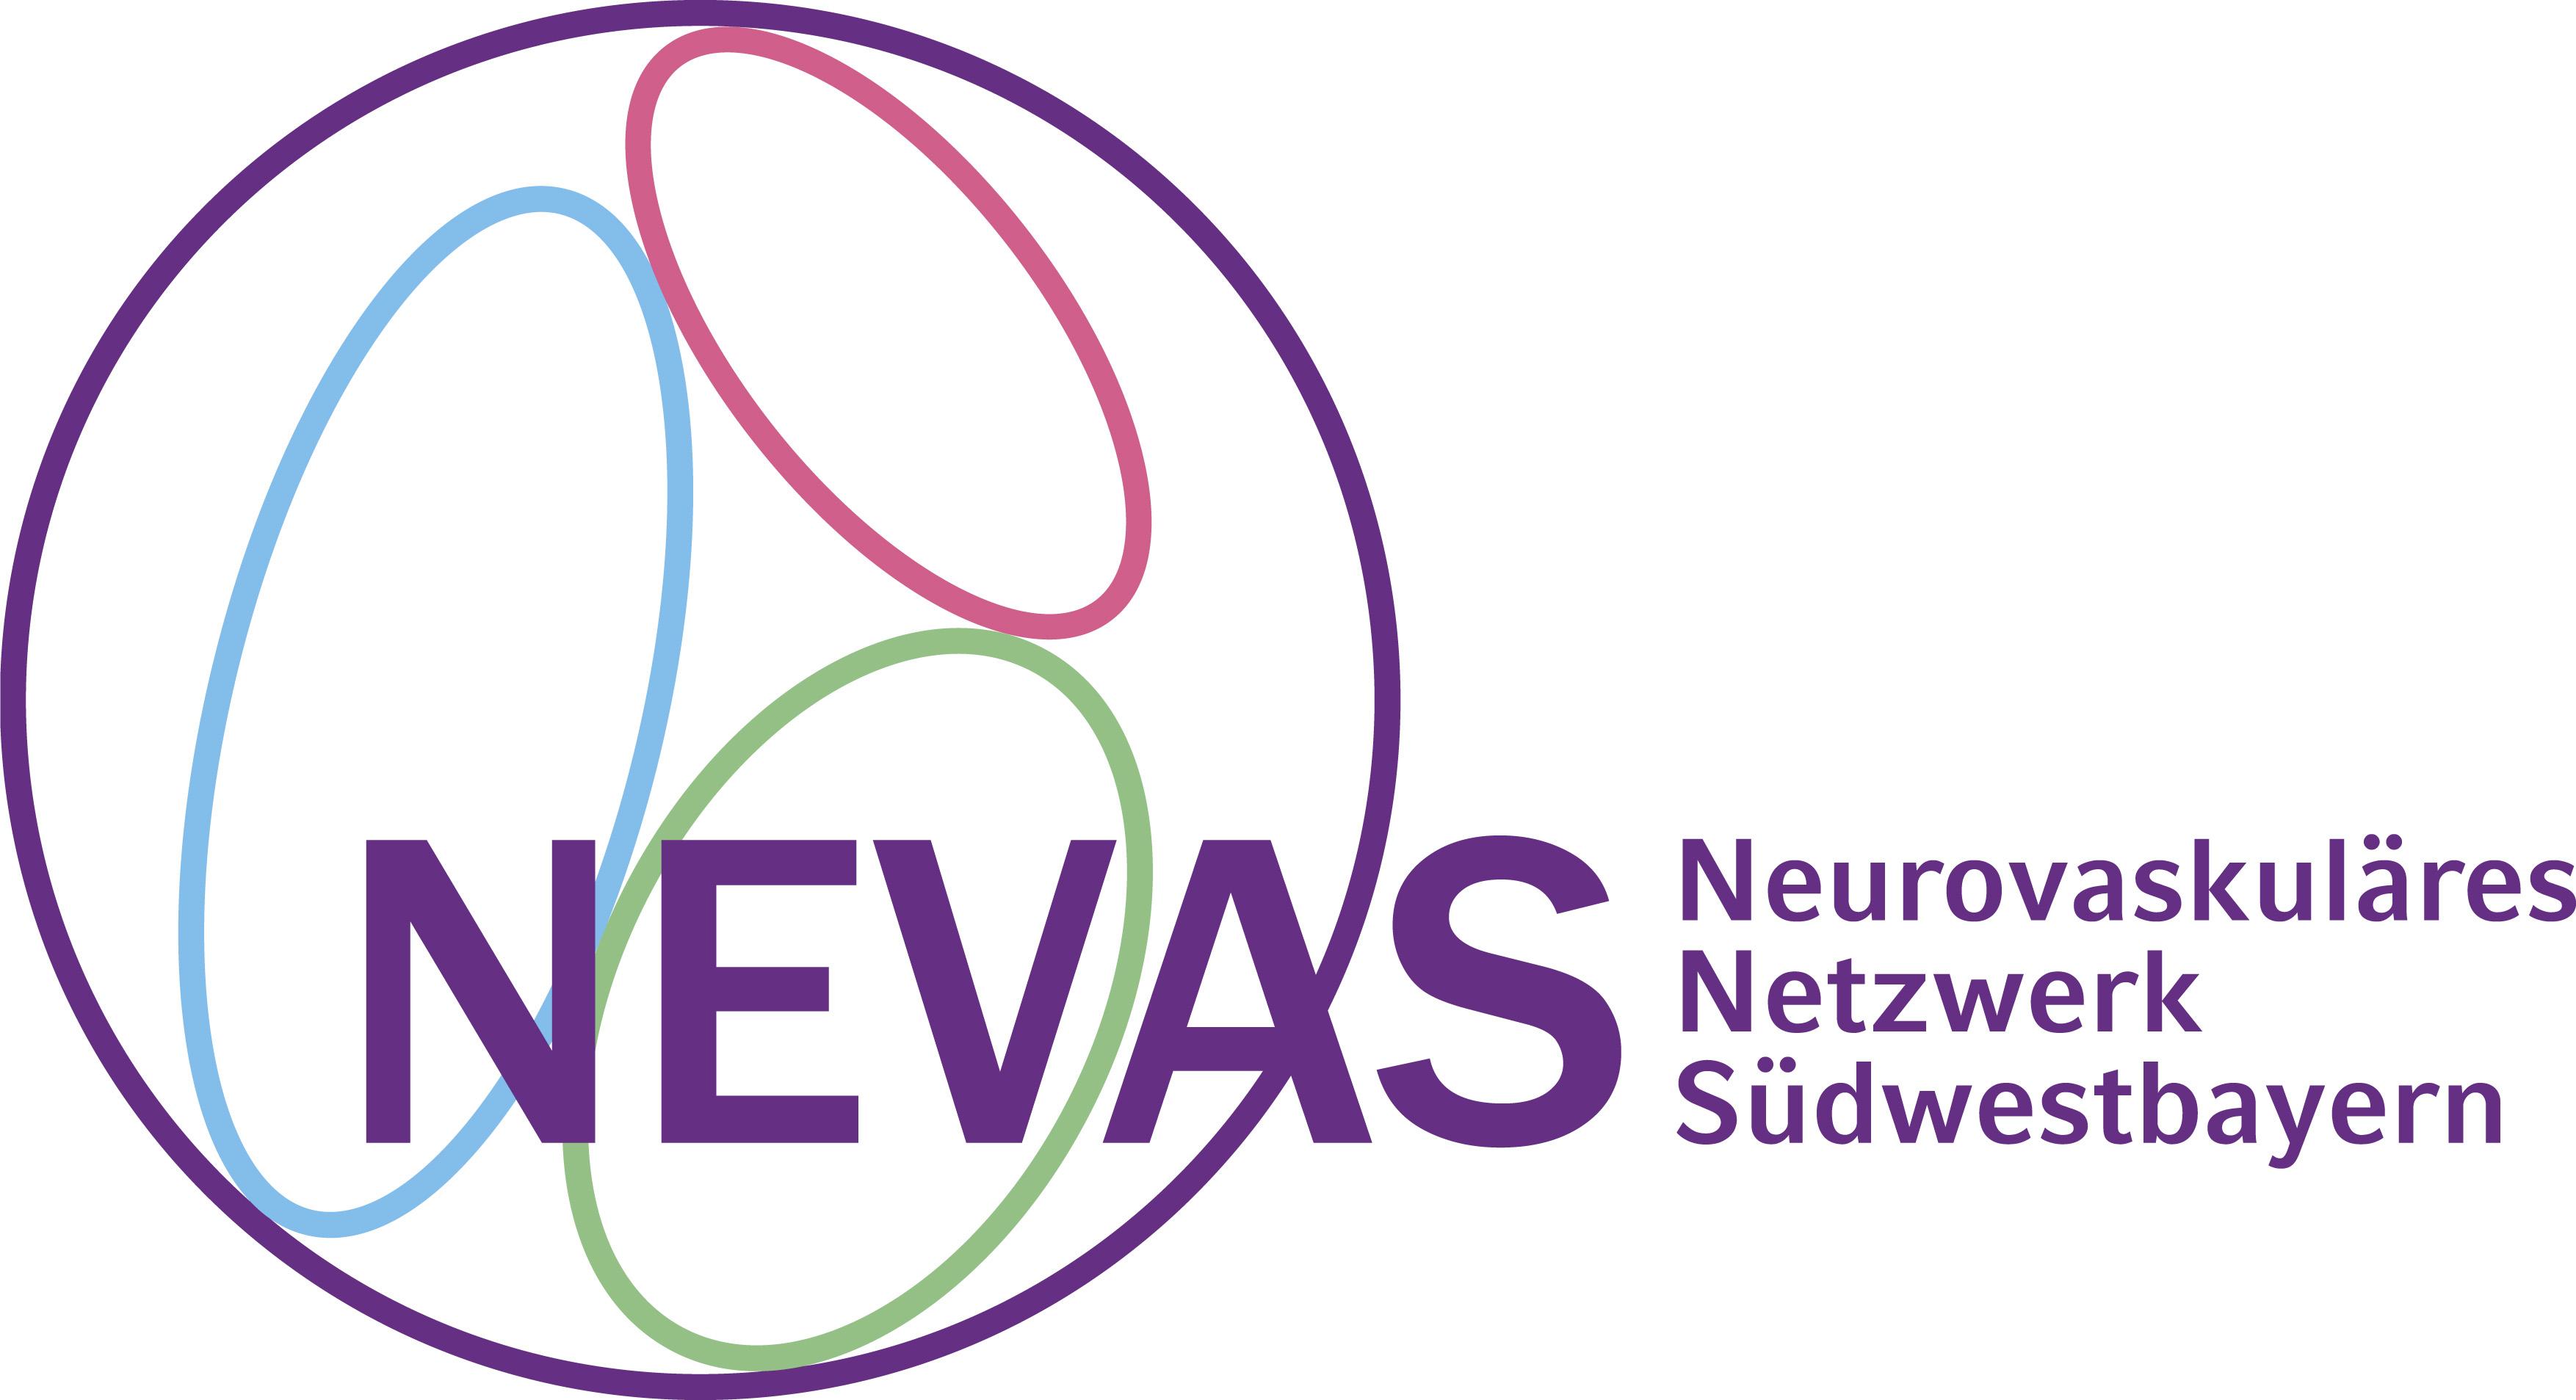 Logo Neurovaskuläres Netzwerk Südwestbayern